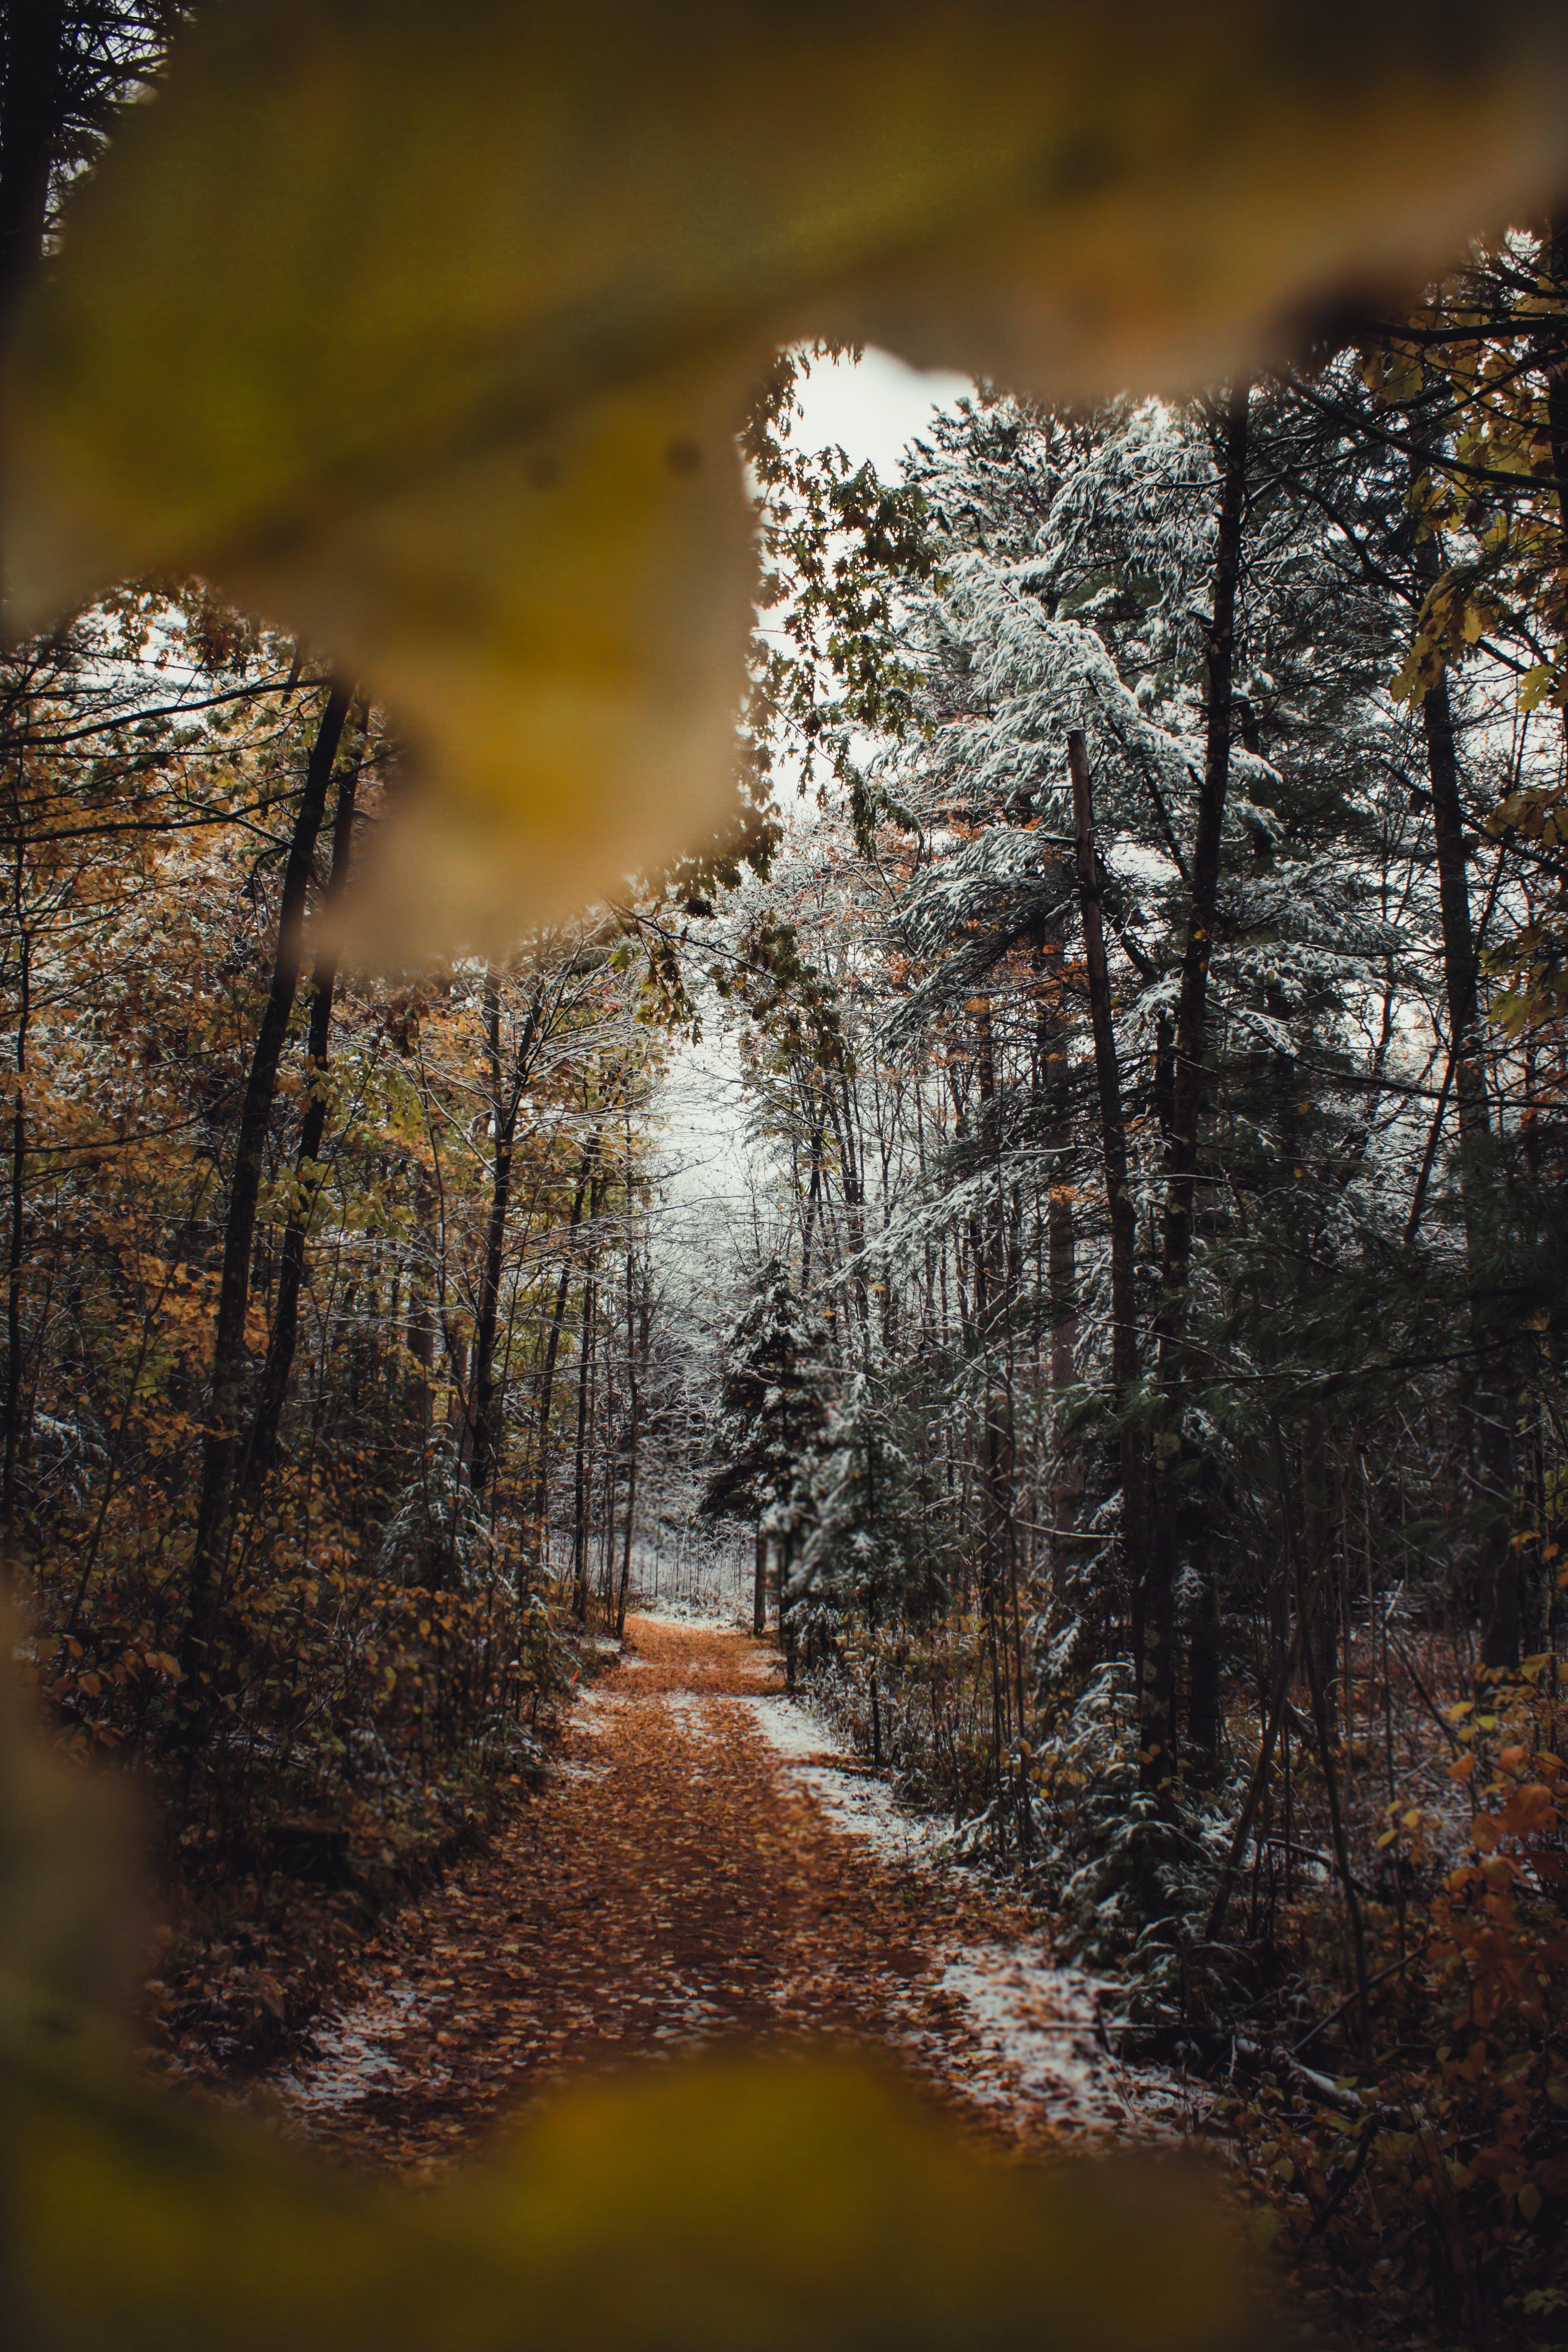 Kostenloses Stock Foto zu bäume, blätter, holz, pfad